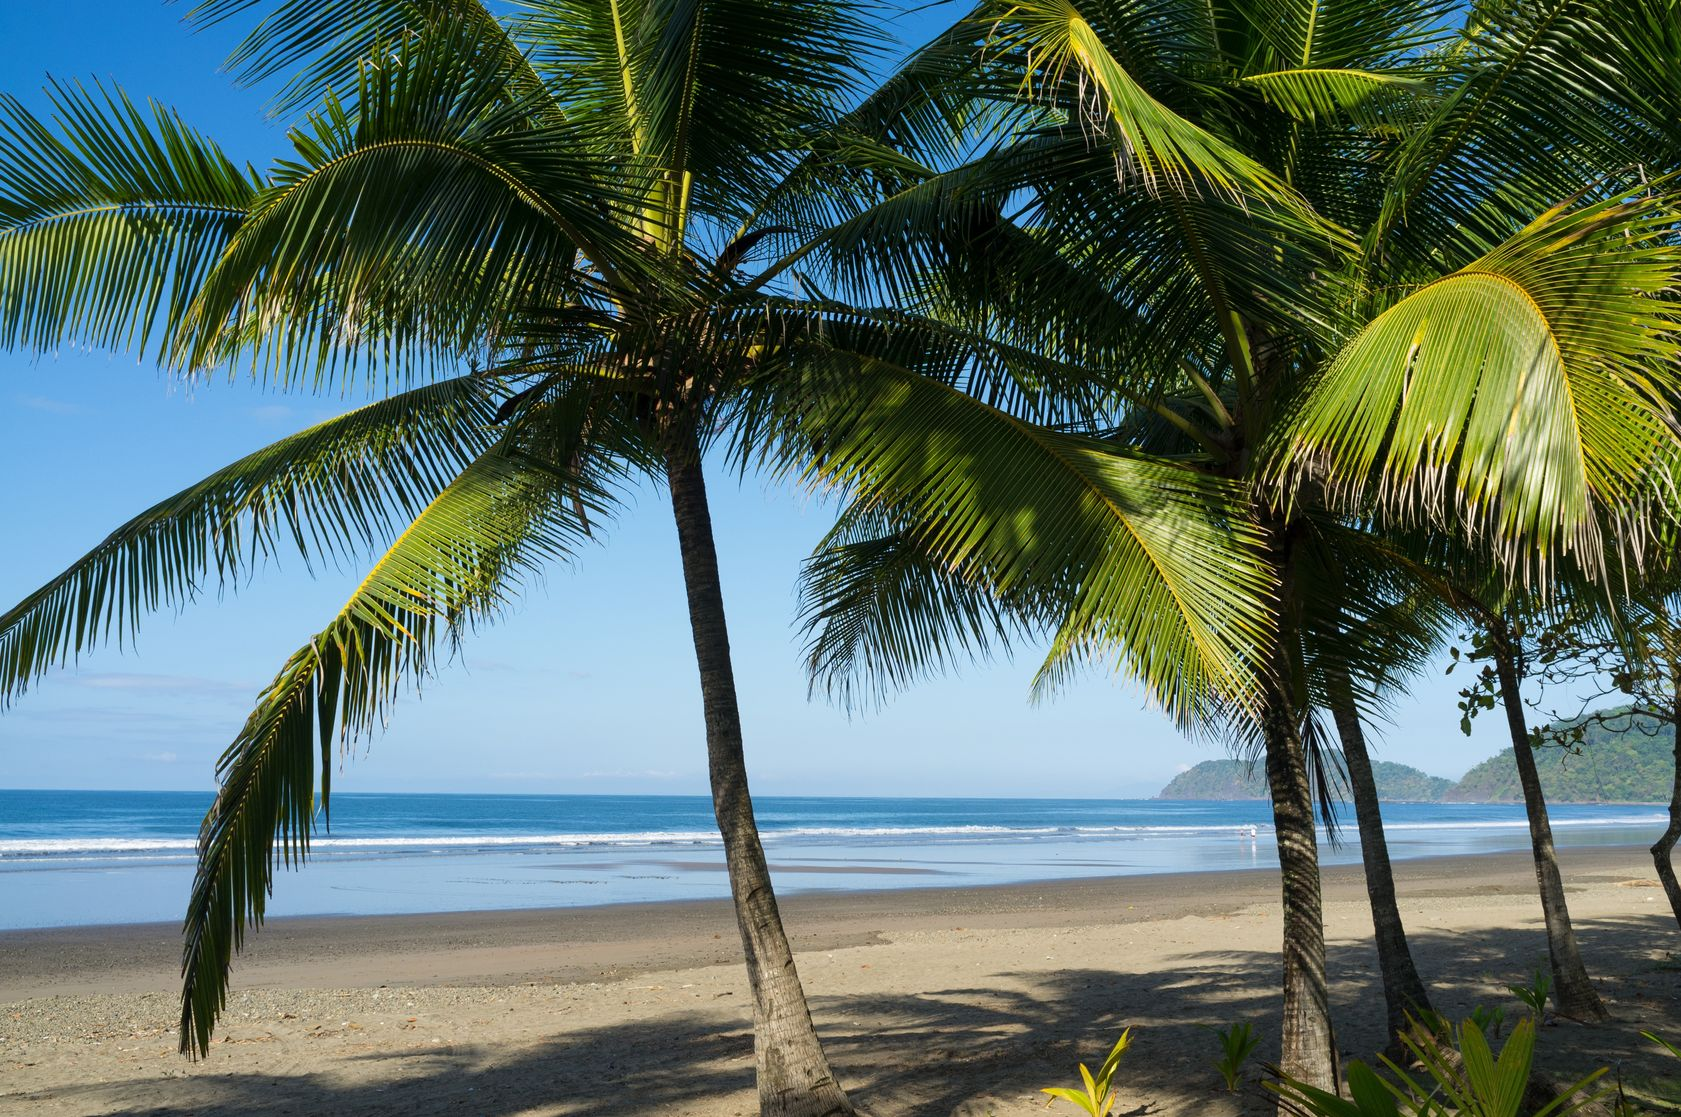 jaco-costa-rica.jpg